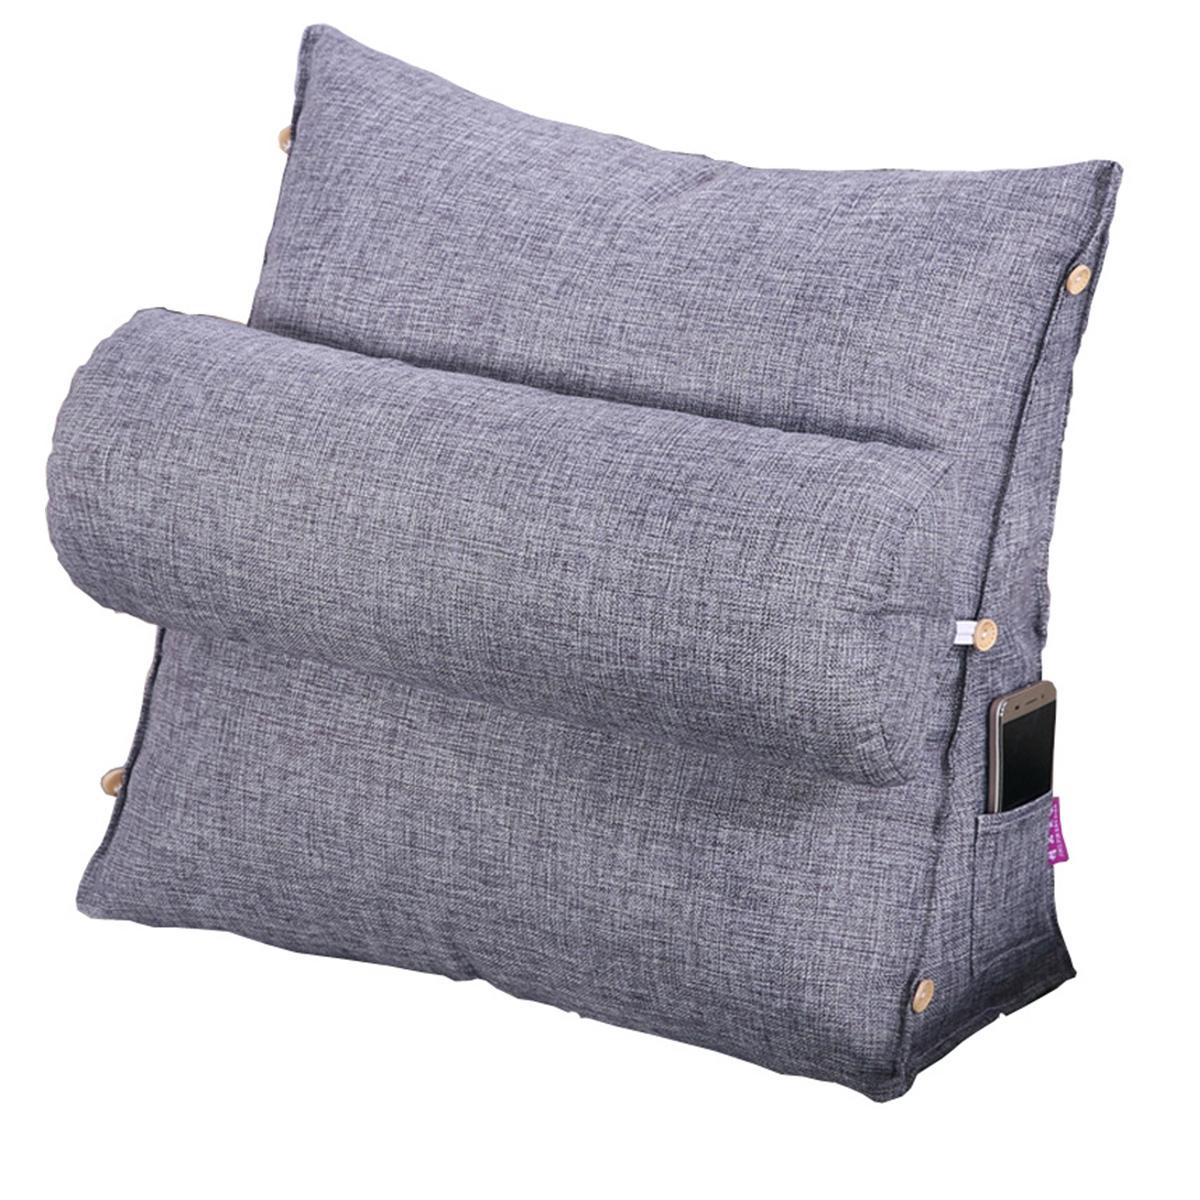 Triangular Back Pillow Rest Sleep Neck Home Sofa Bed Lumbar Office Cushion Office Home Use